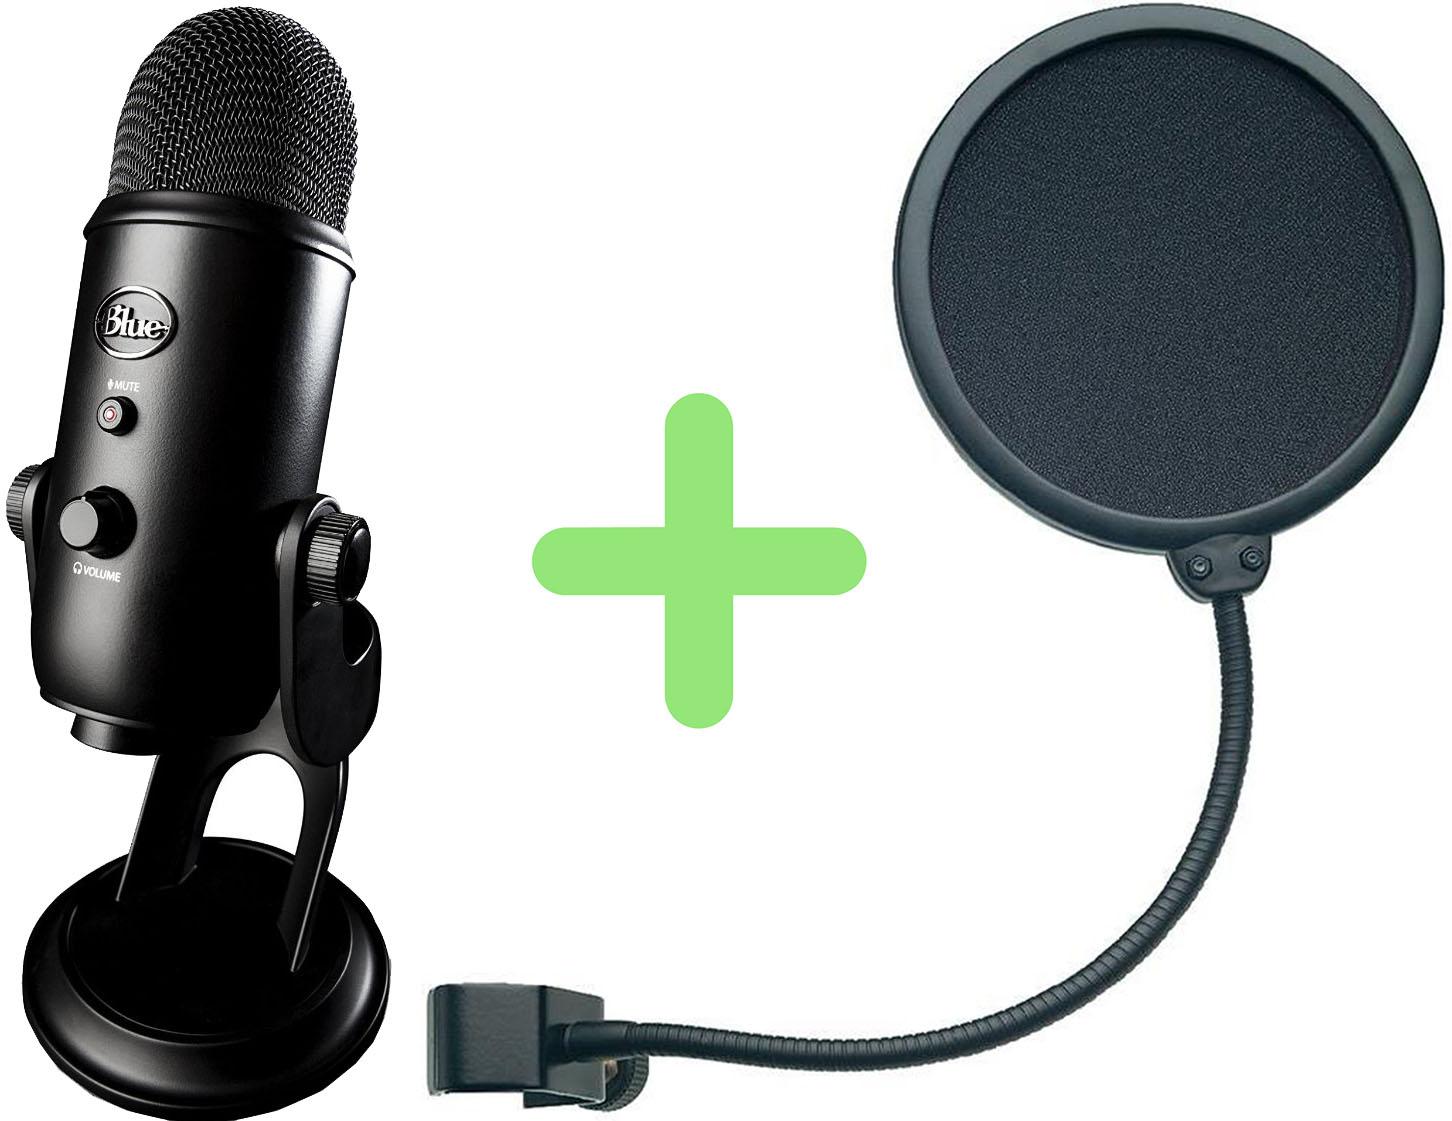 Yeti Blackout+Konig & Meyer 23956-000-55 - конденсаторный микрофон+поп-фильтр (Black/Black)